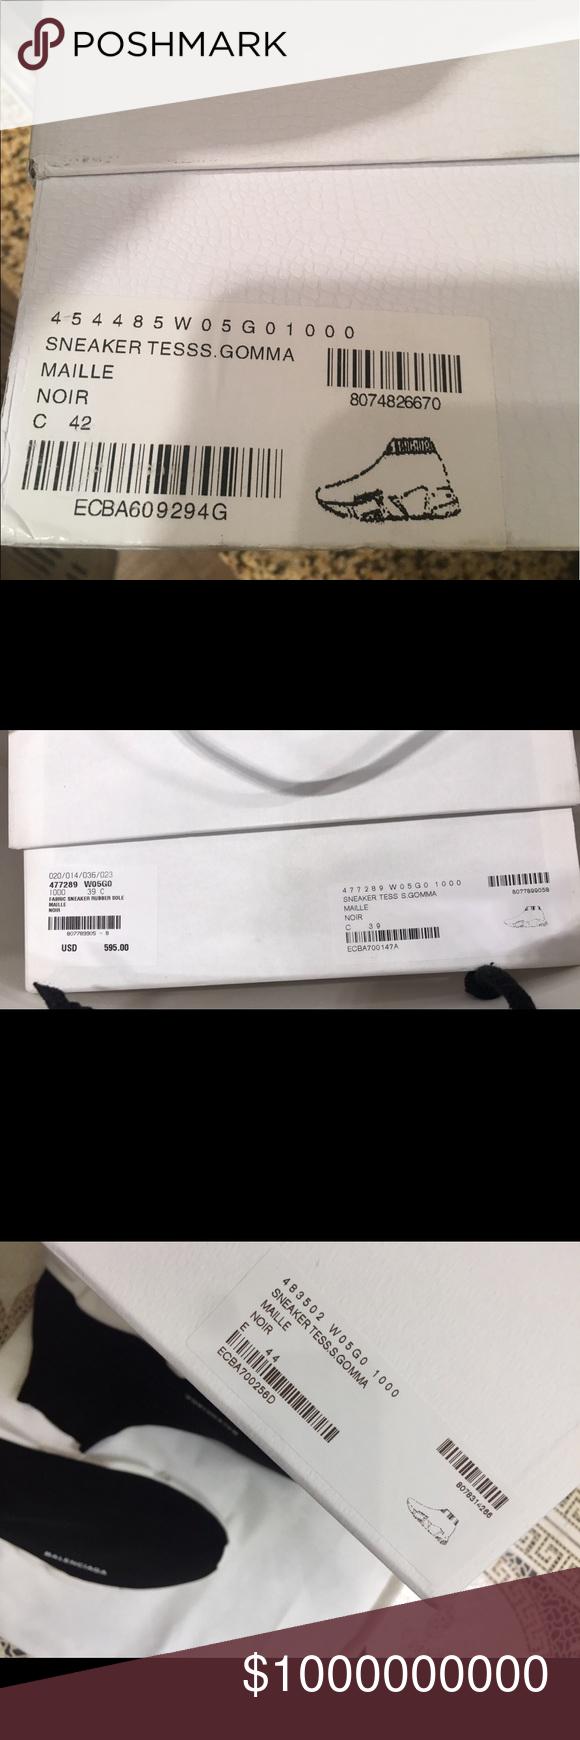 Authentic vsfake Balenciaga shoe box